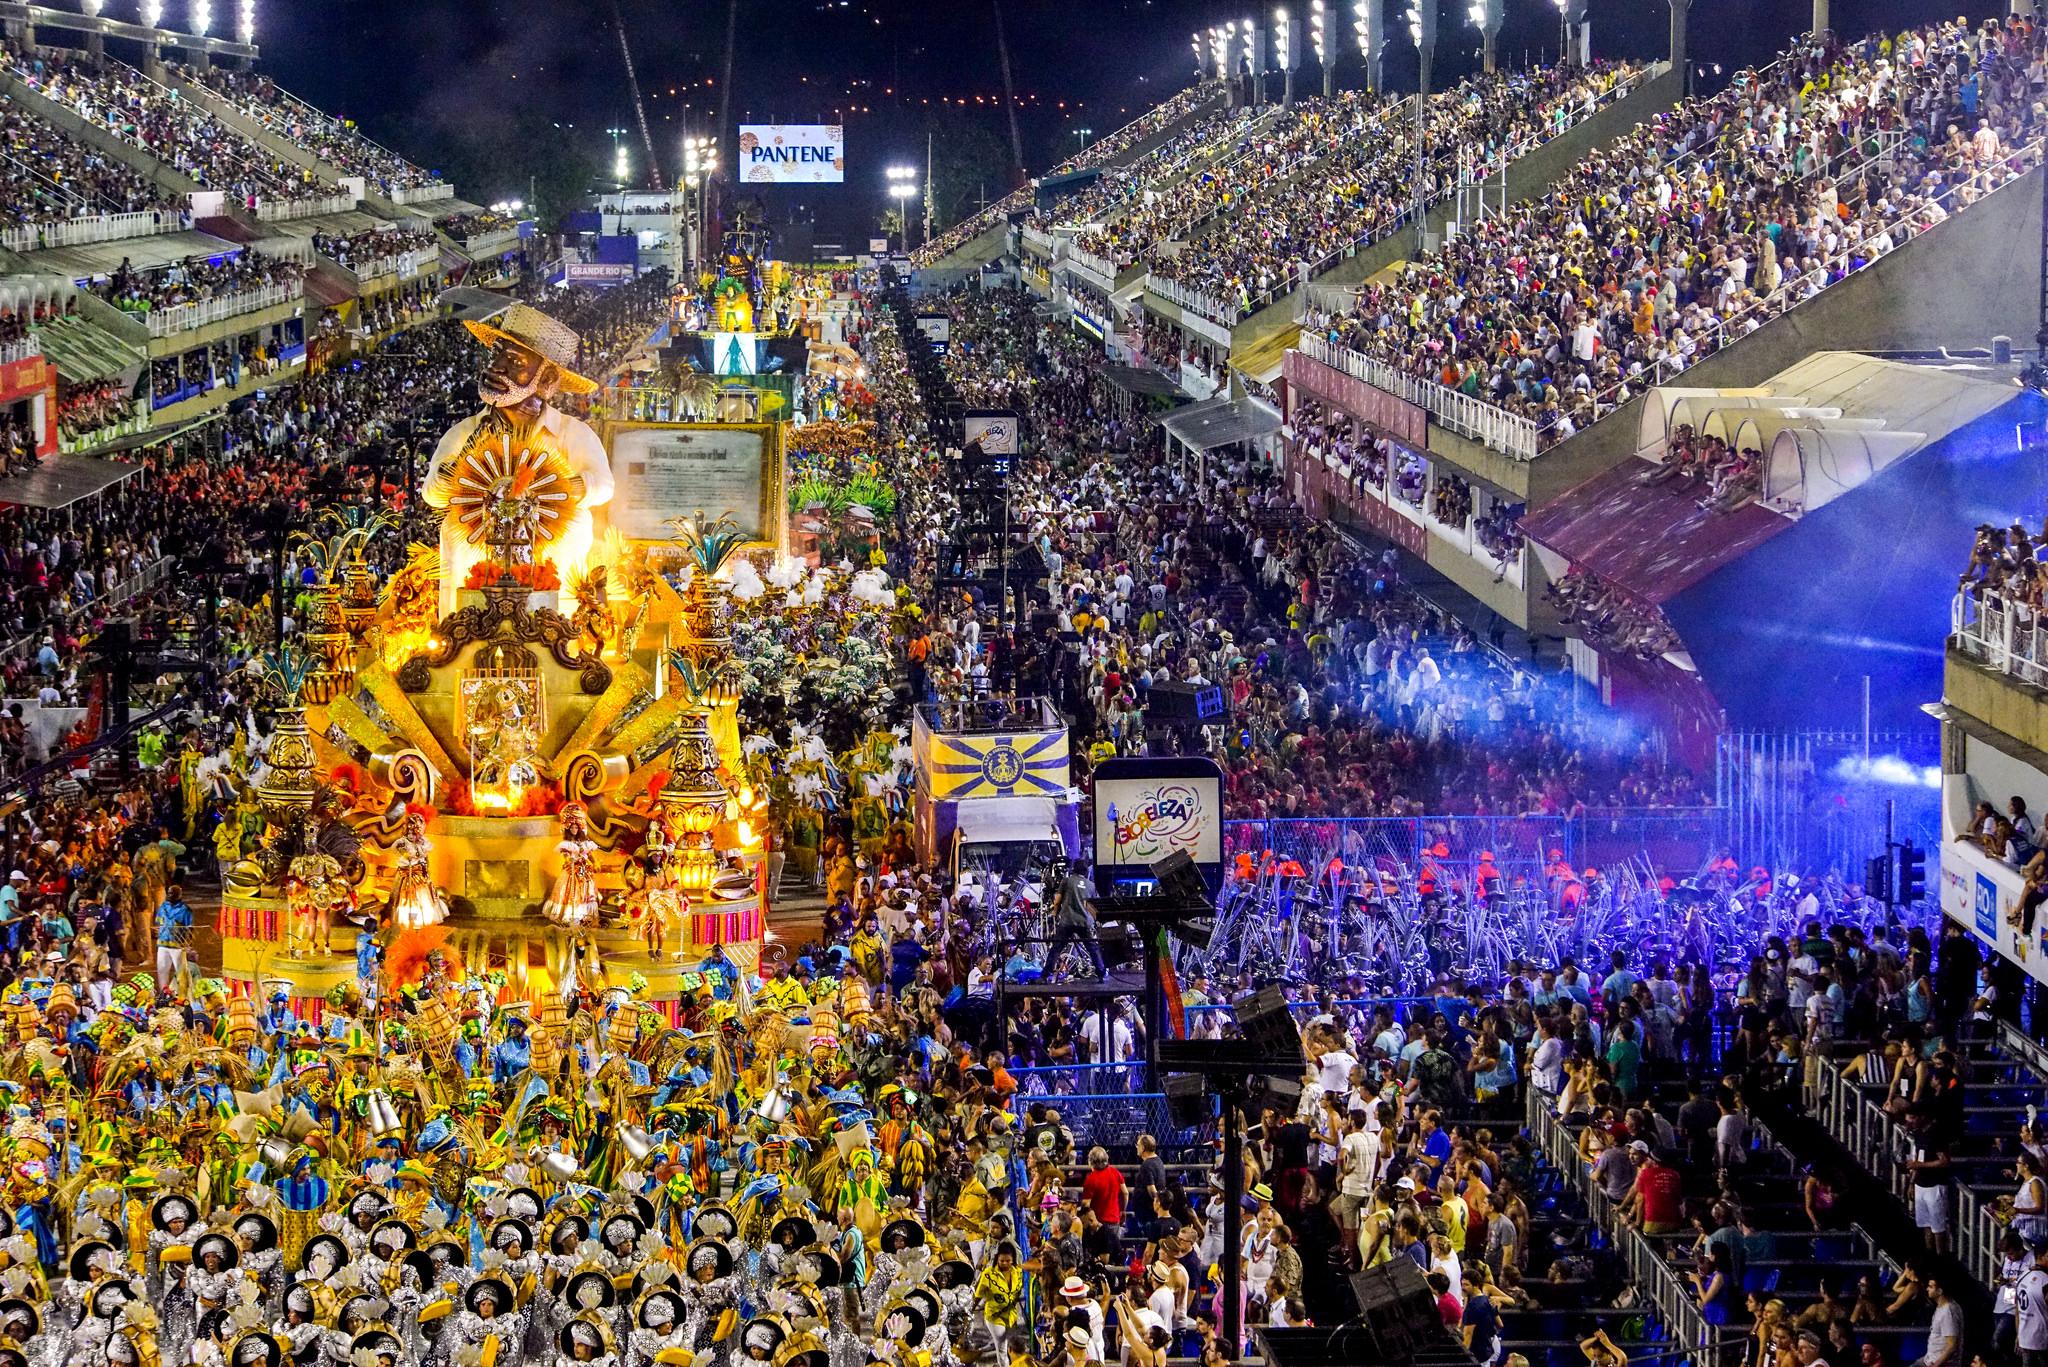 rio carnival parade  u2013 day 1  u2013 11 february 2018